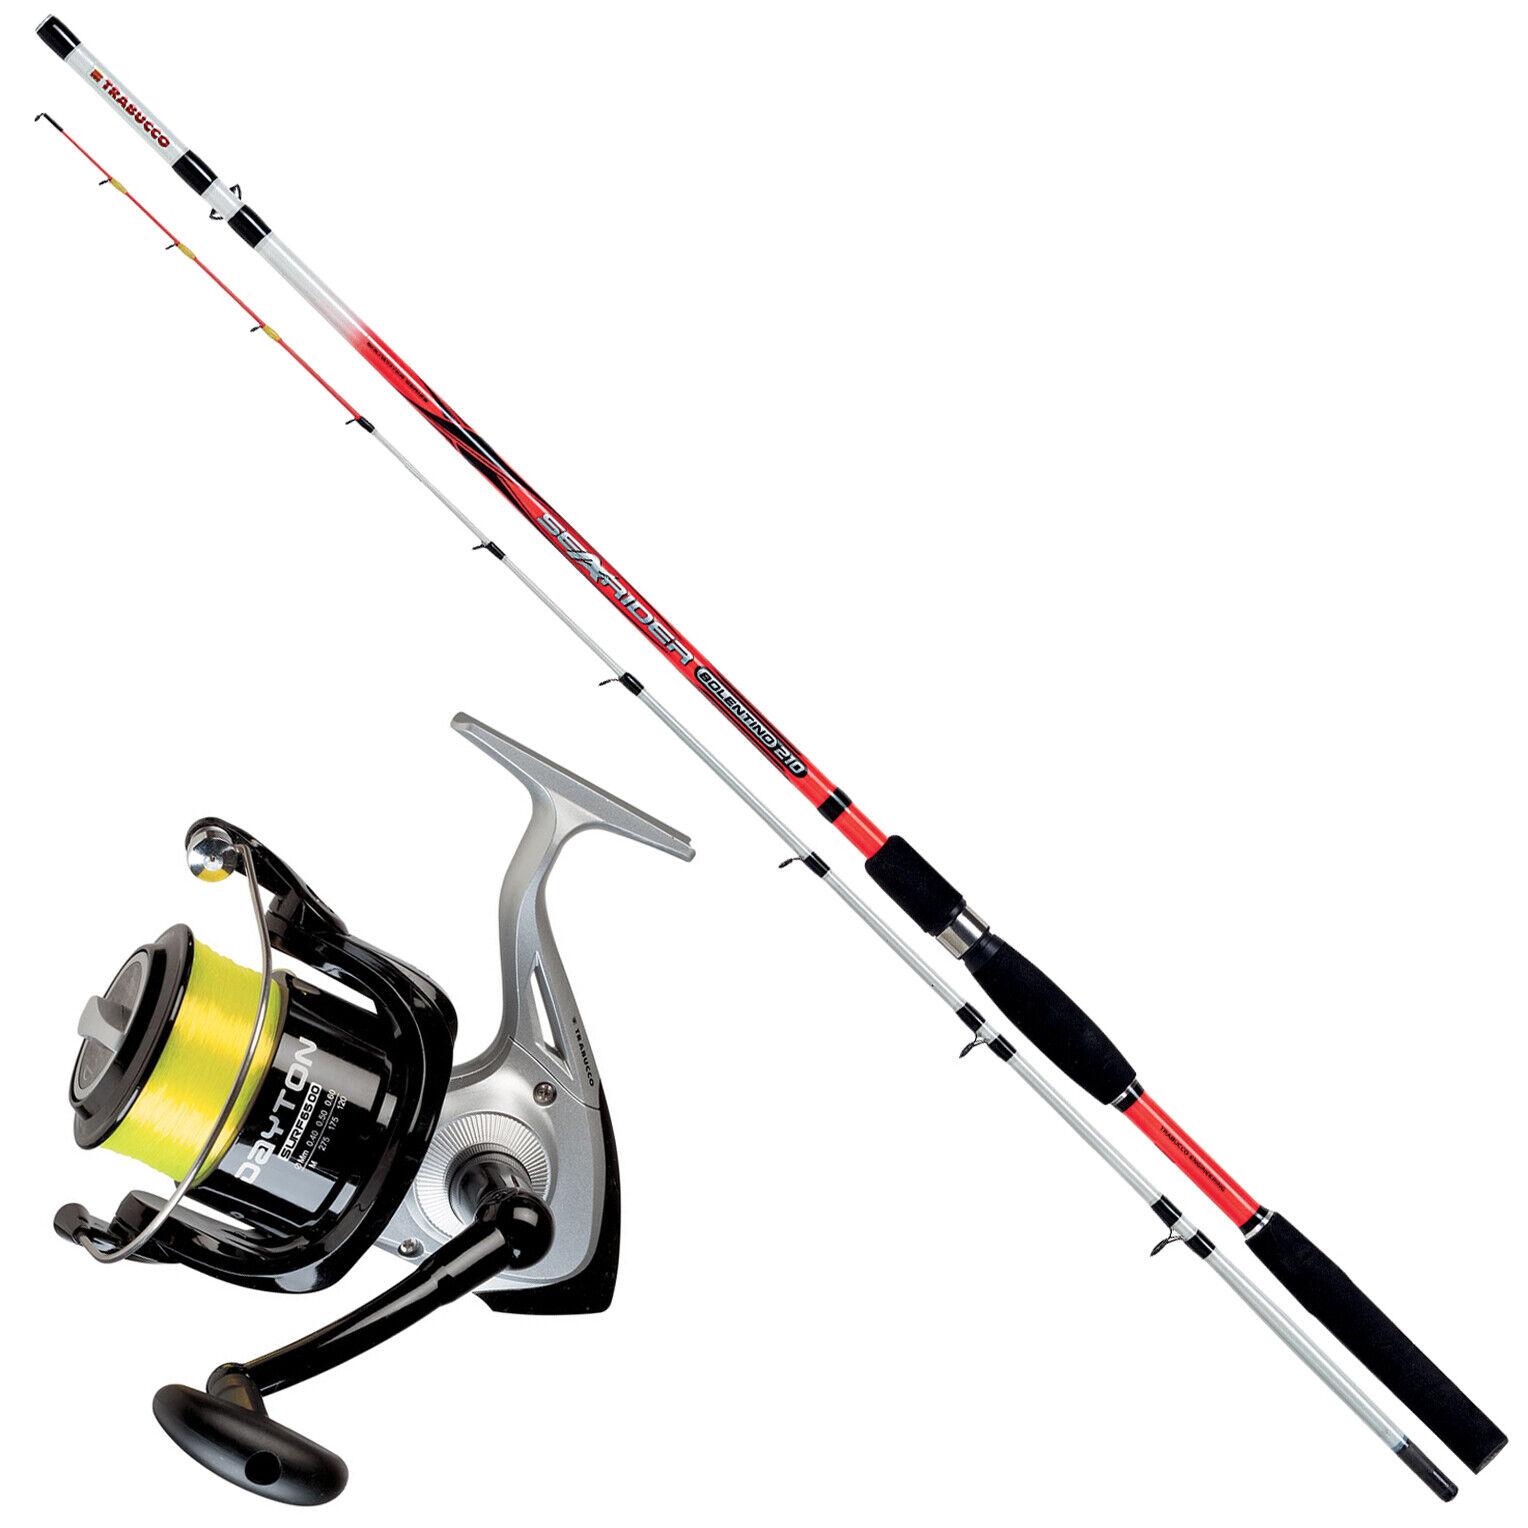 KP3318 Kit Pesca Bolentino Trabucco Canna Searider 2,10m 200Gr + Mulinello FEU